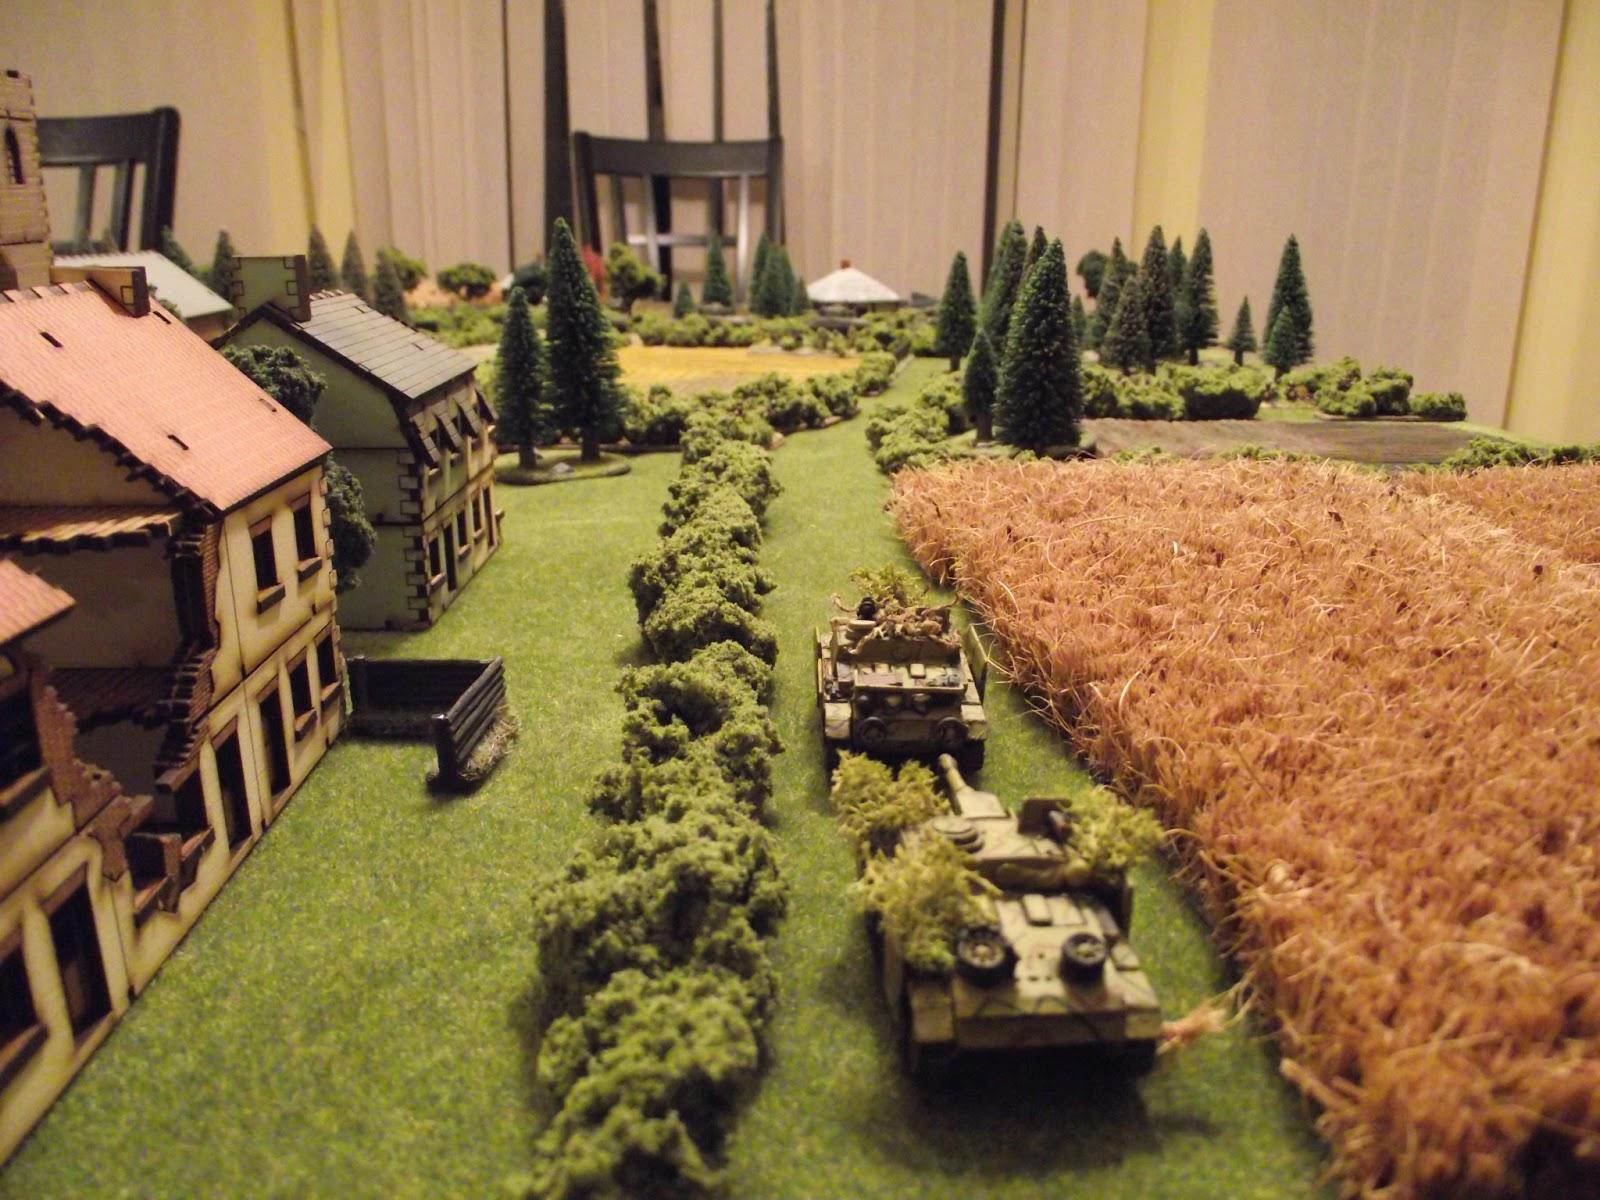 Turn 2: German reinforcements arrive in the form of two StuGs.